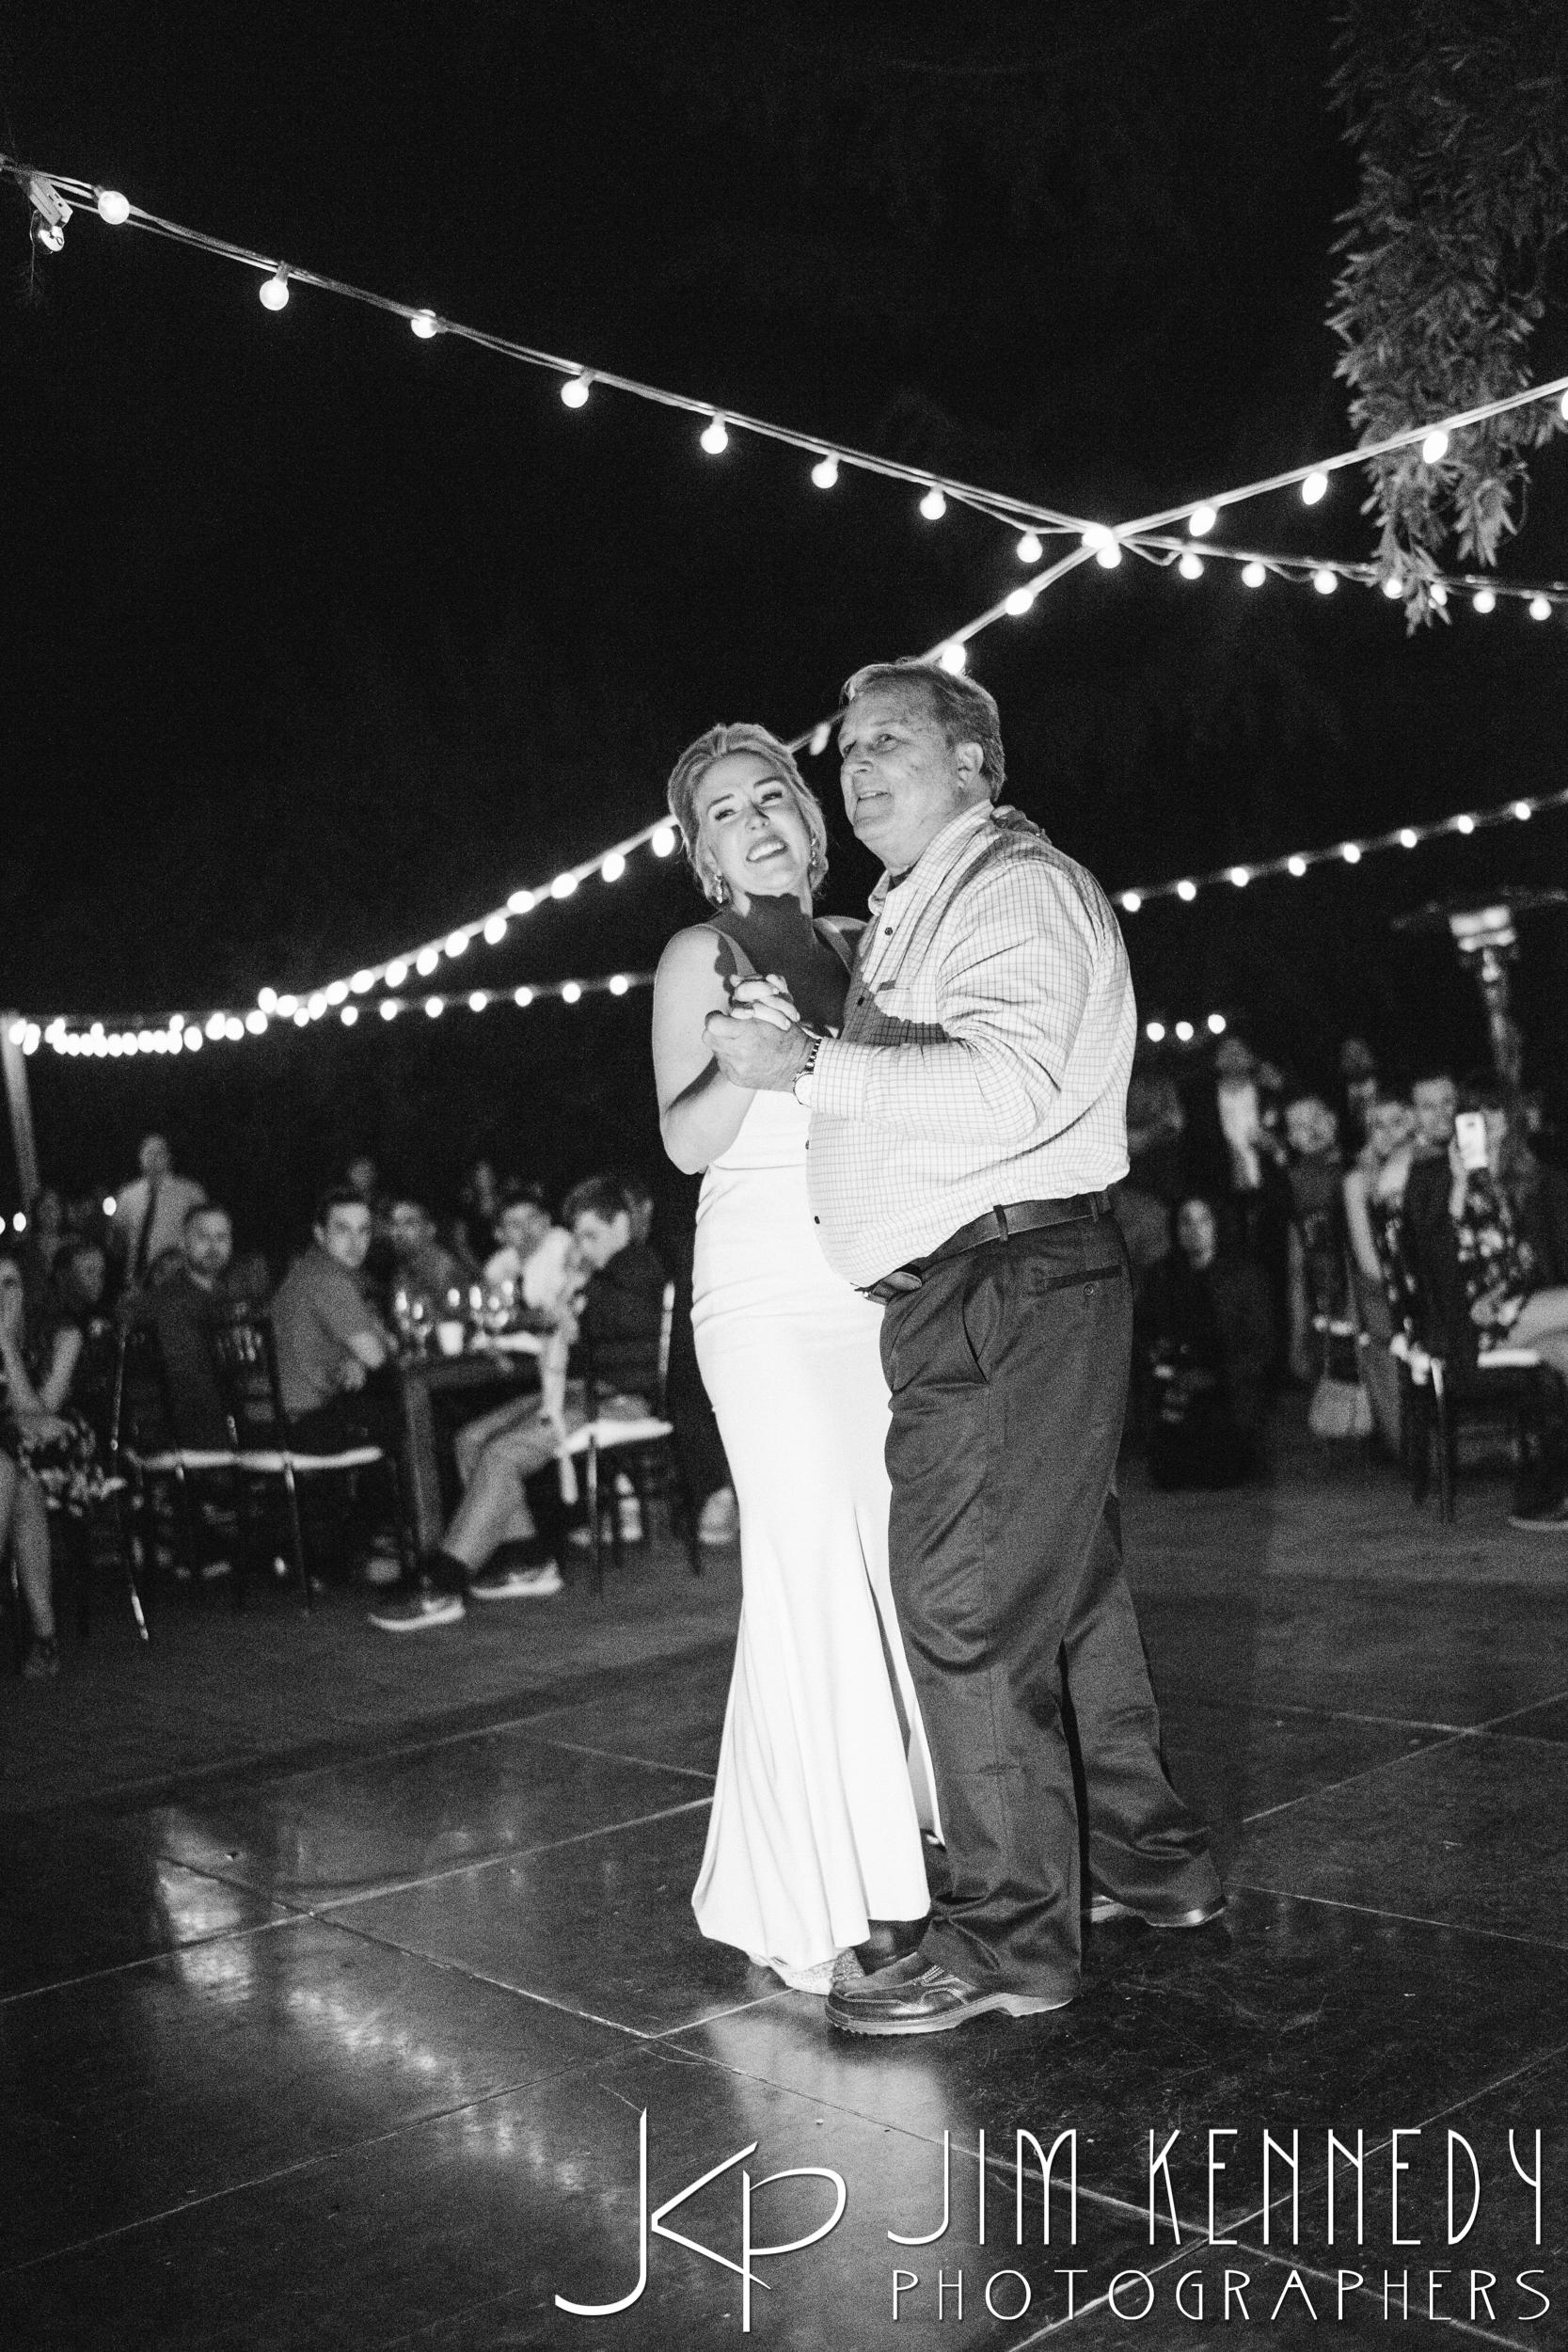 jim_kennedy_photographers_highland_springs_wedding_caitlyn_0197.jpg